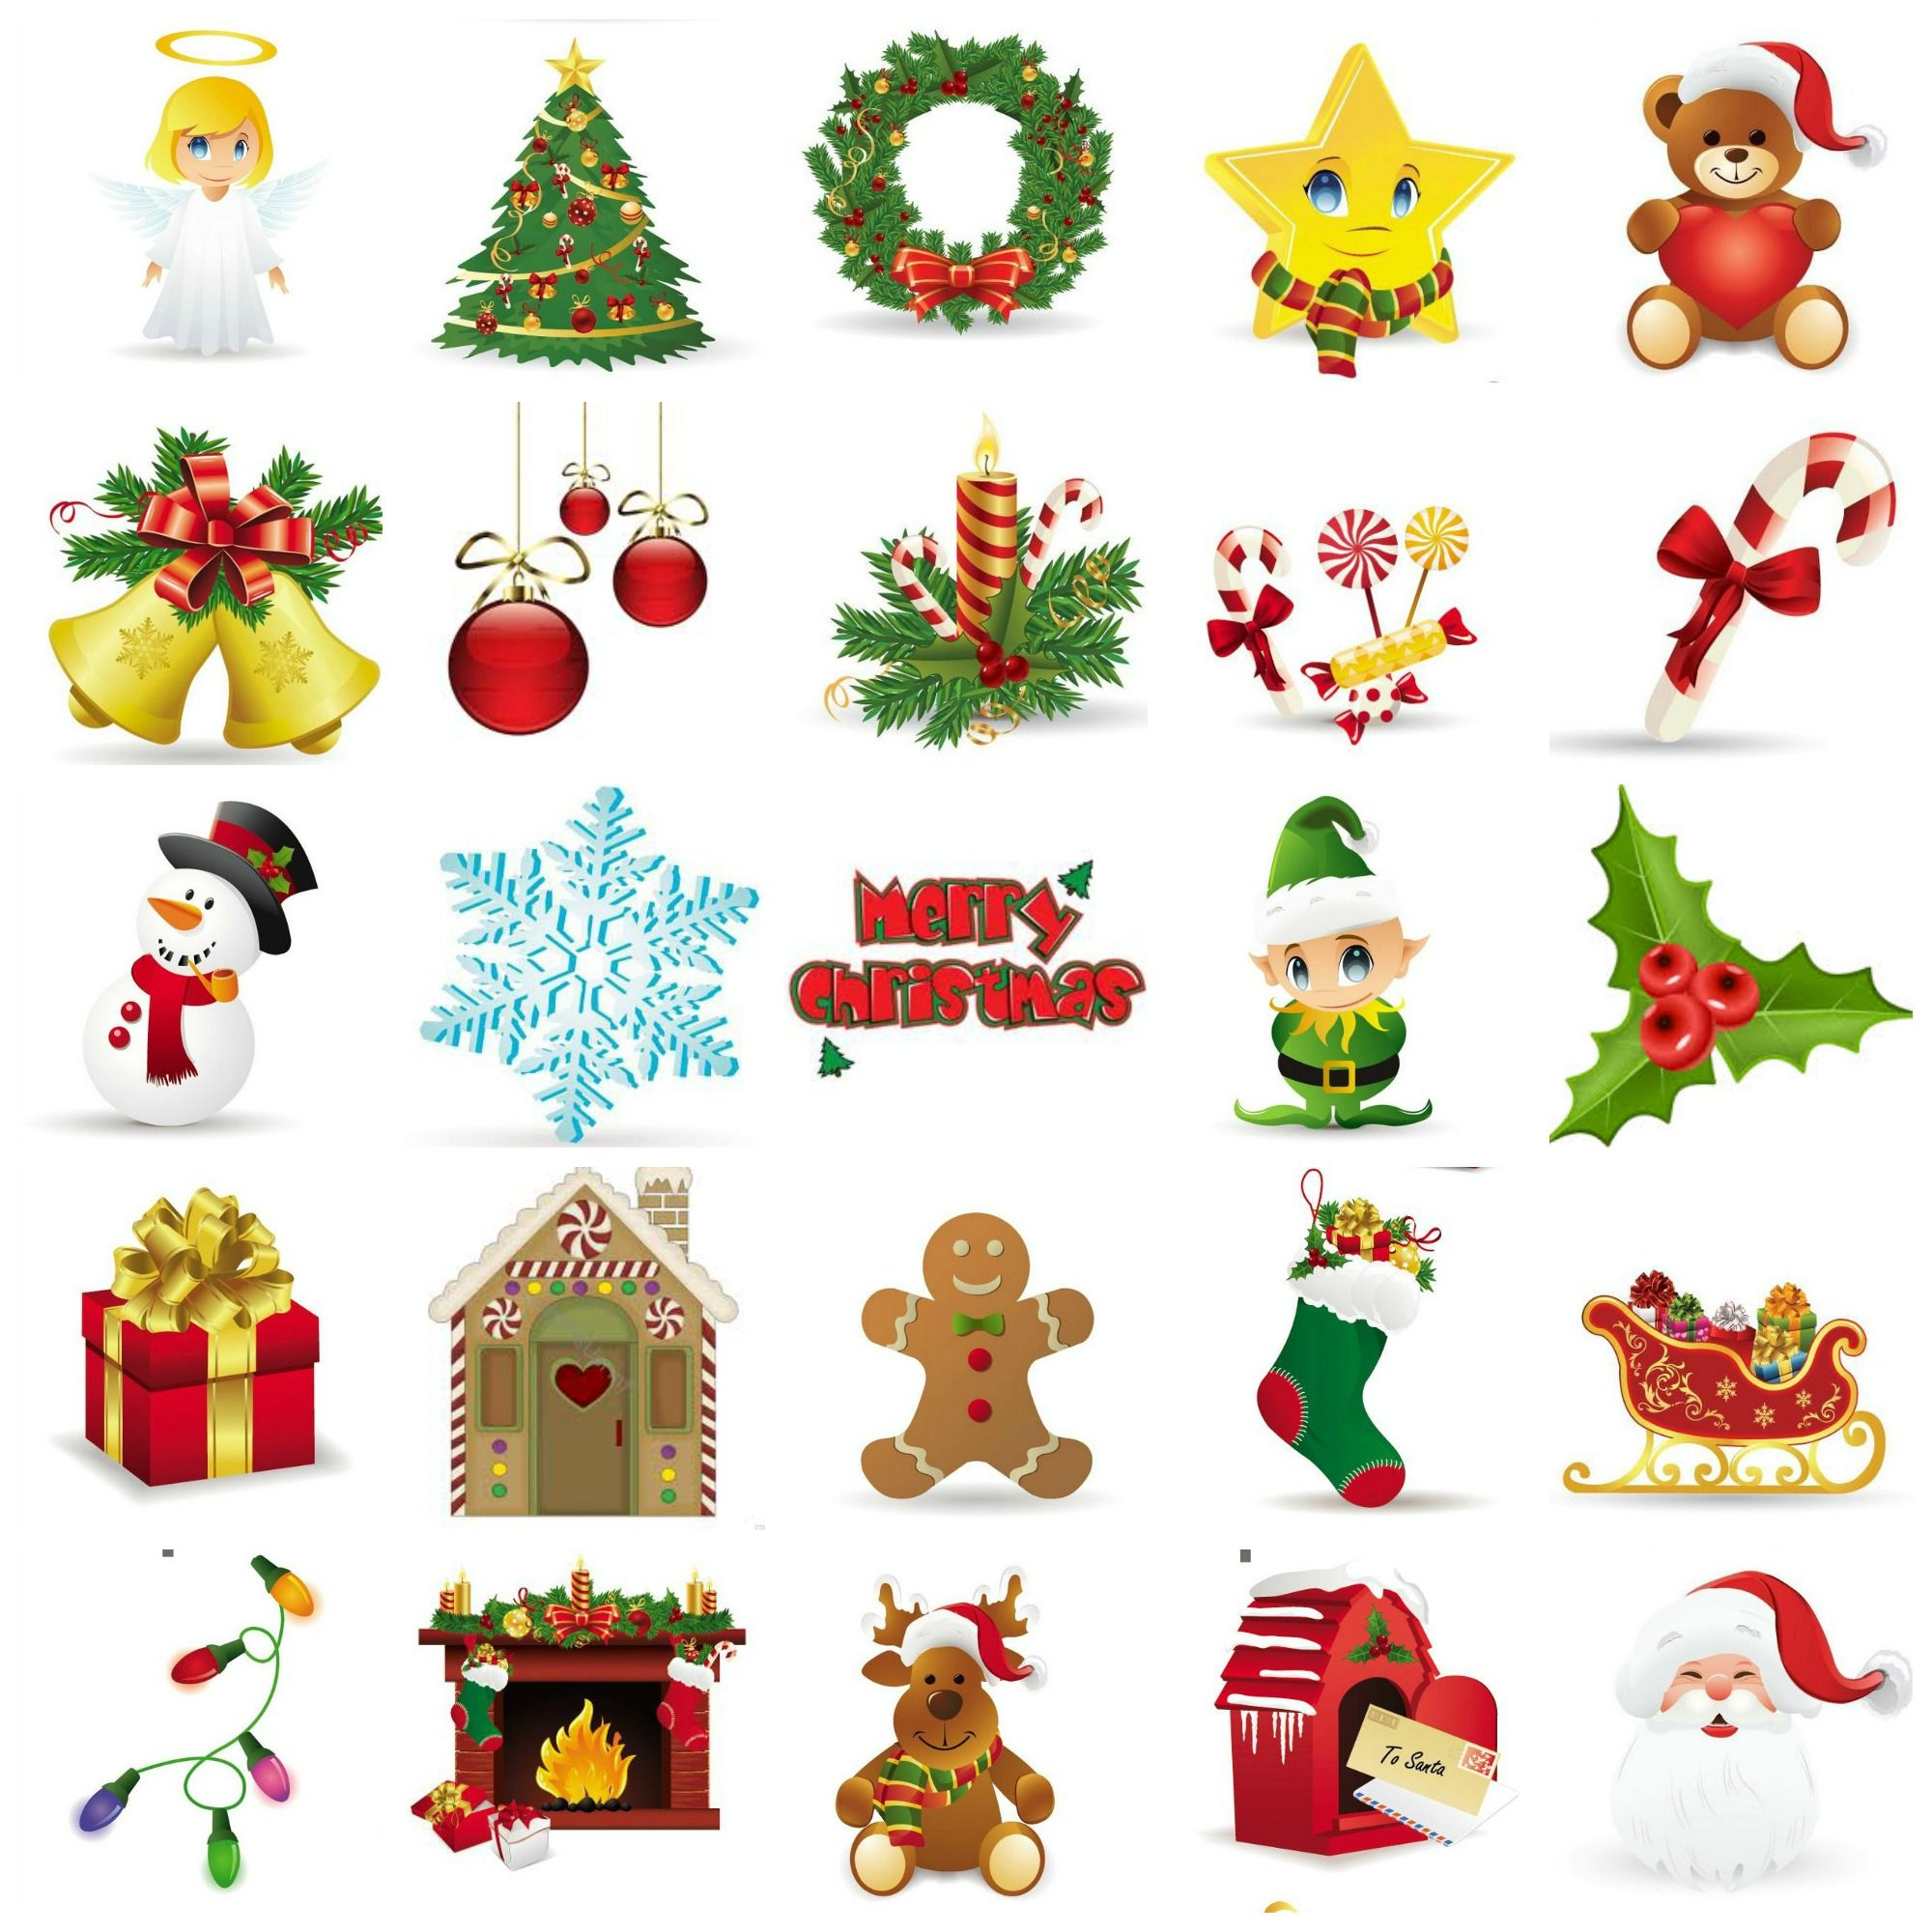 Christmas Bingo Free Printables Toys In The Dryer Free Printable Holiday Cards Printable Holiday Card Christmas Cutouts